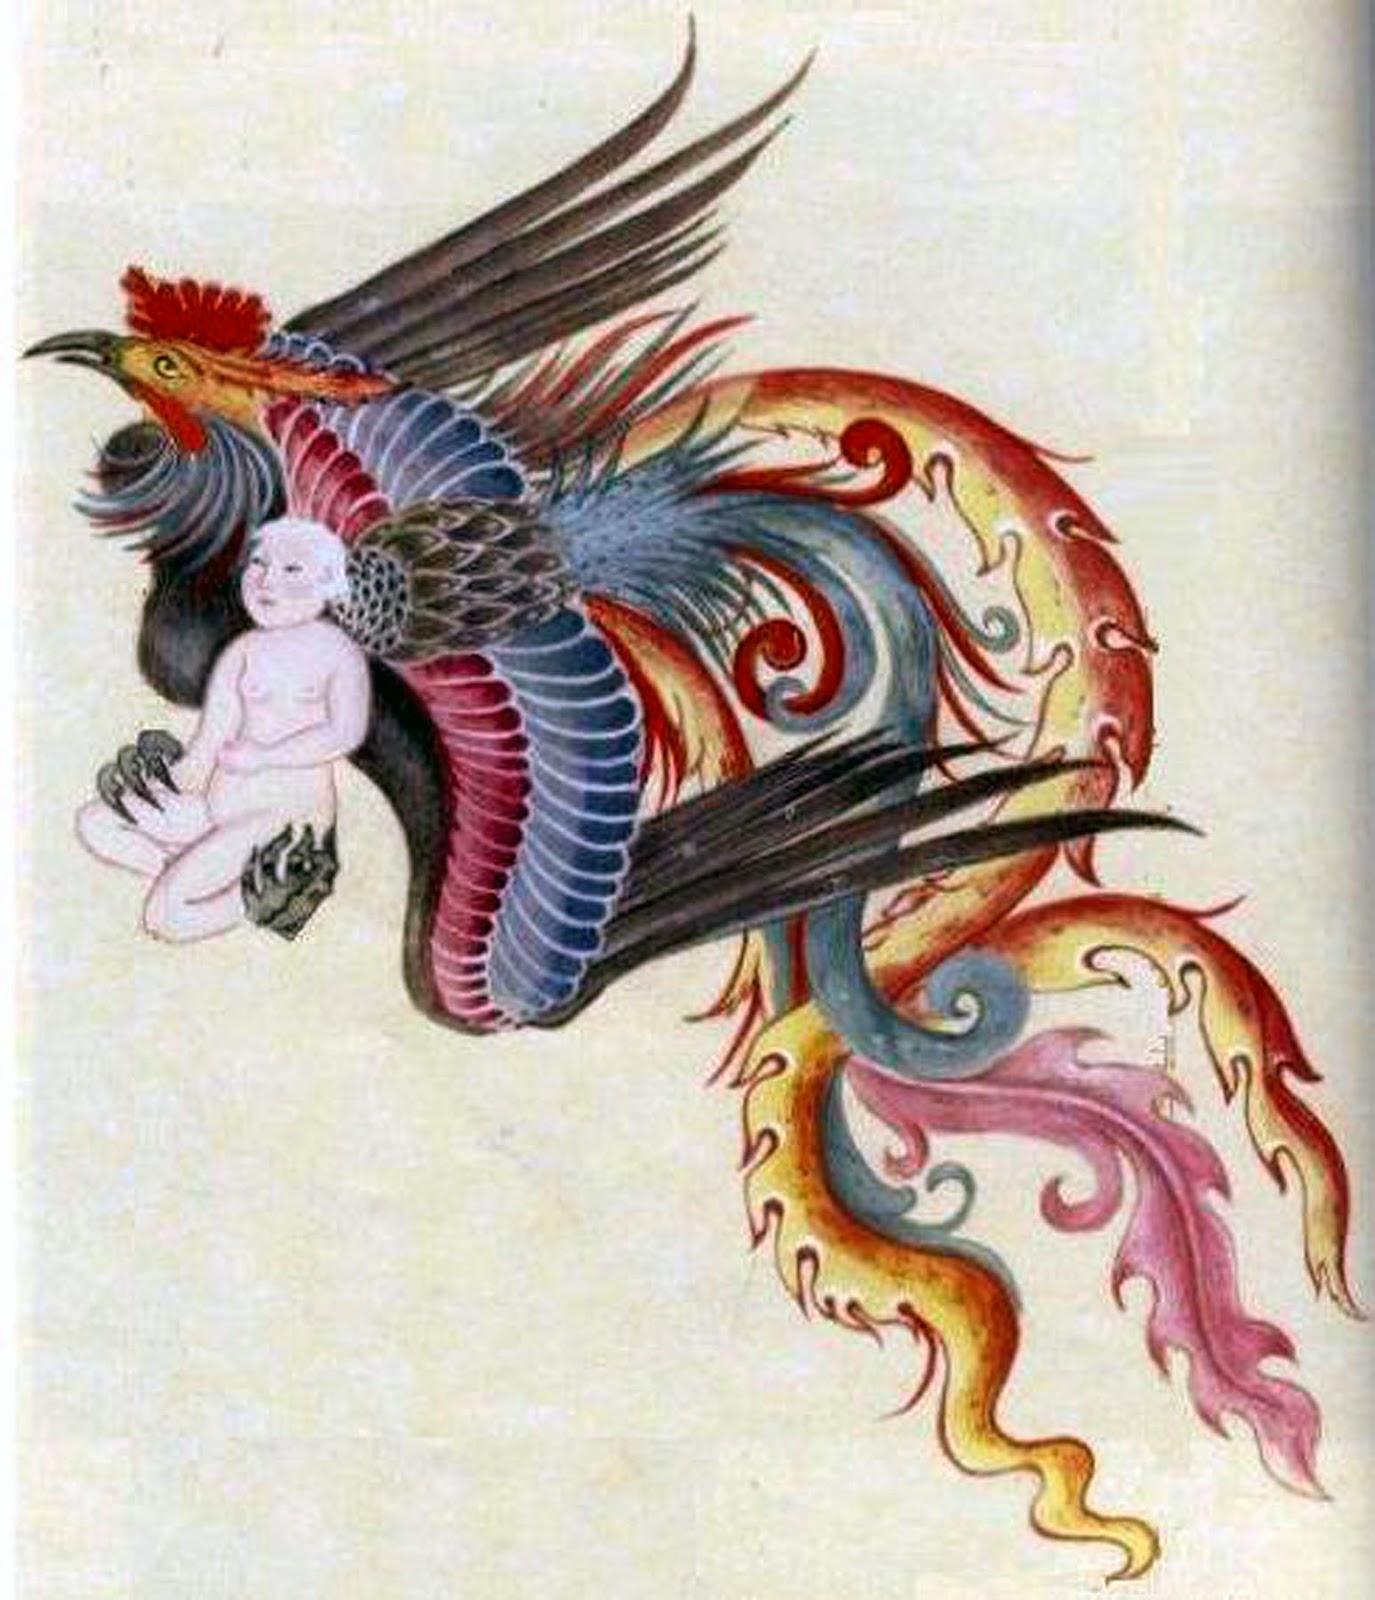 New page books january 2014 for Huma bird tattoo